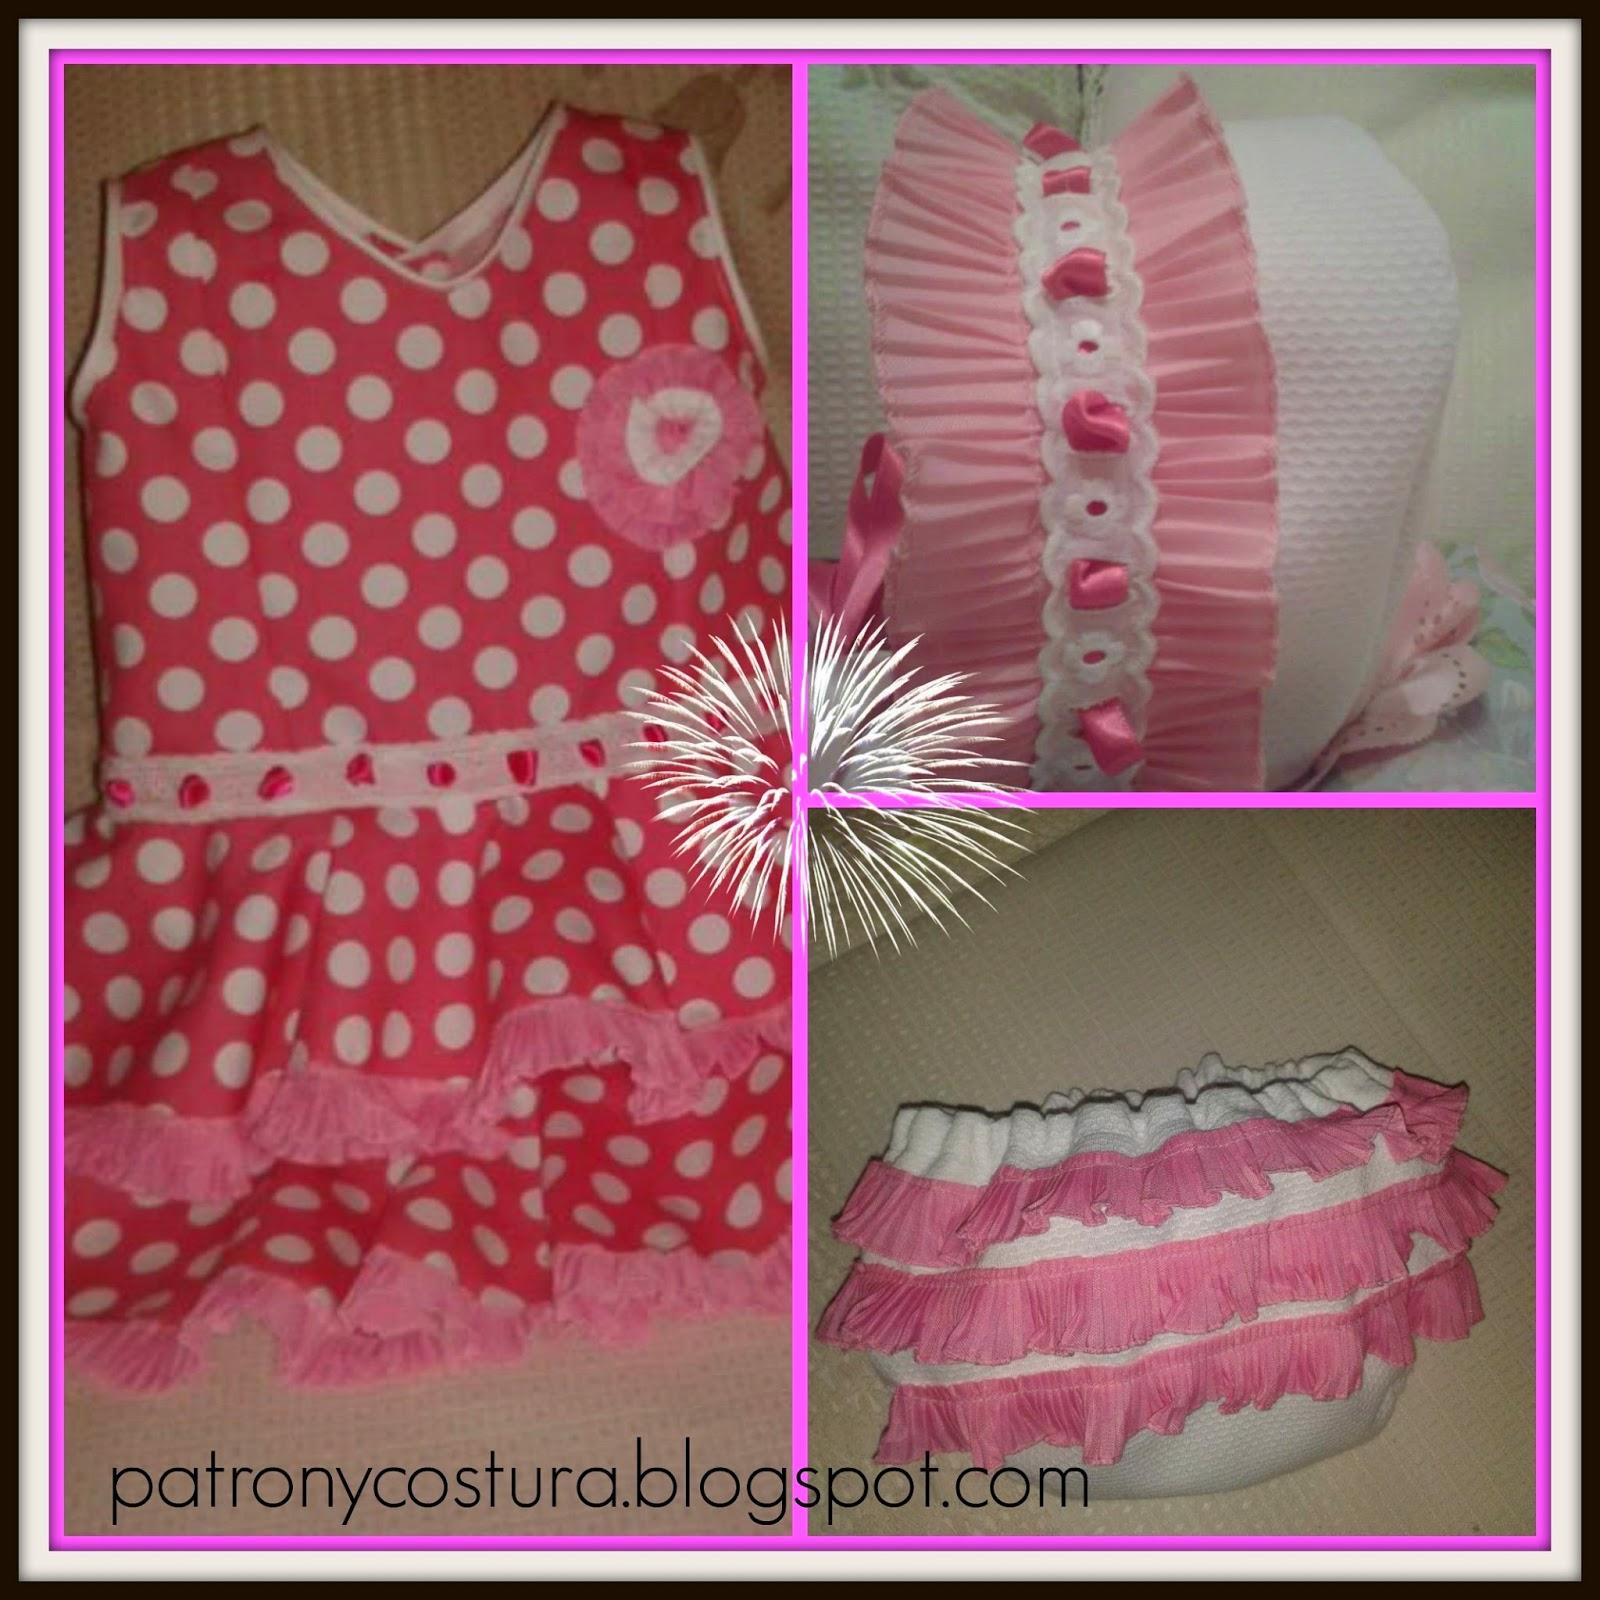 http://patronycostura.blogspot.com.es/2013/12/tema-30-vestido-sevillana-para-ninas.html